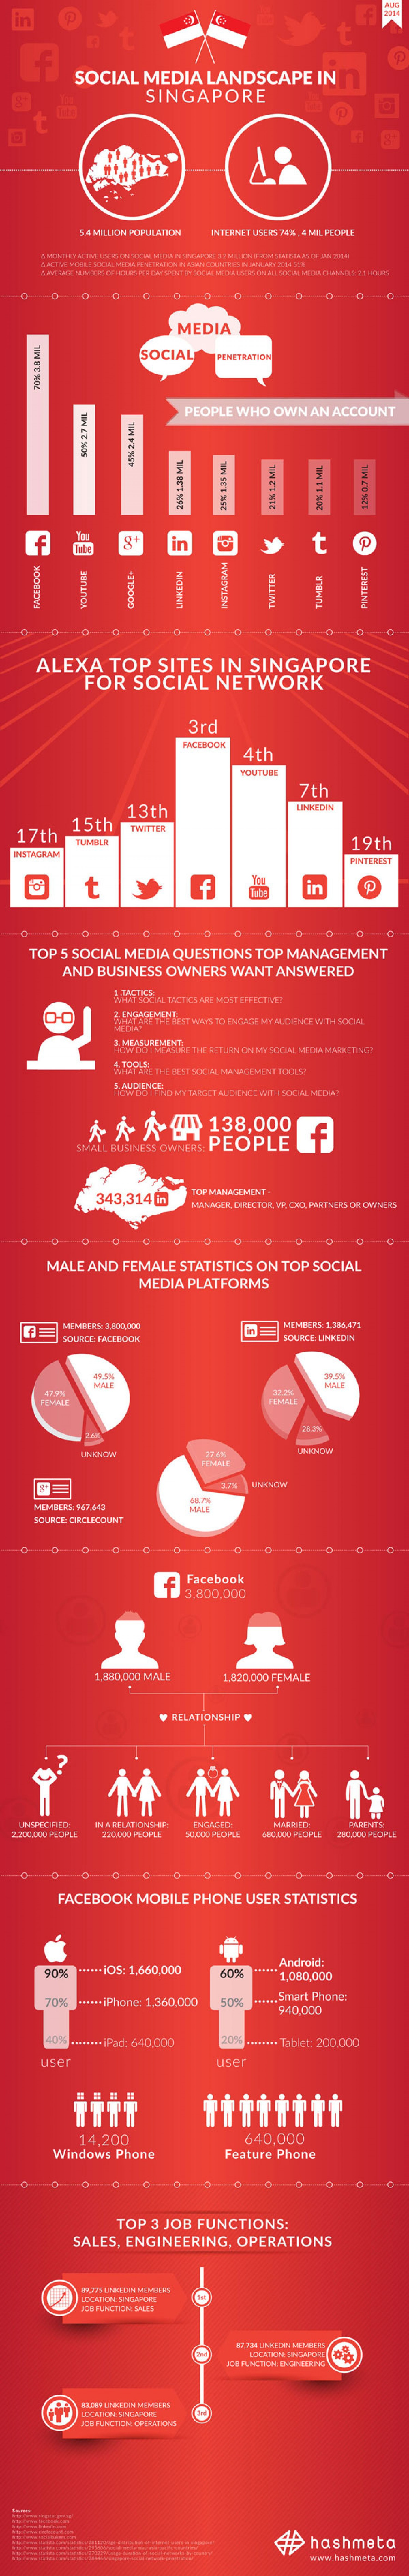 Social Media Statistics Singapore 2014 | 007 Social Media ...